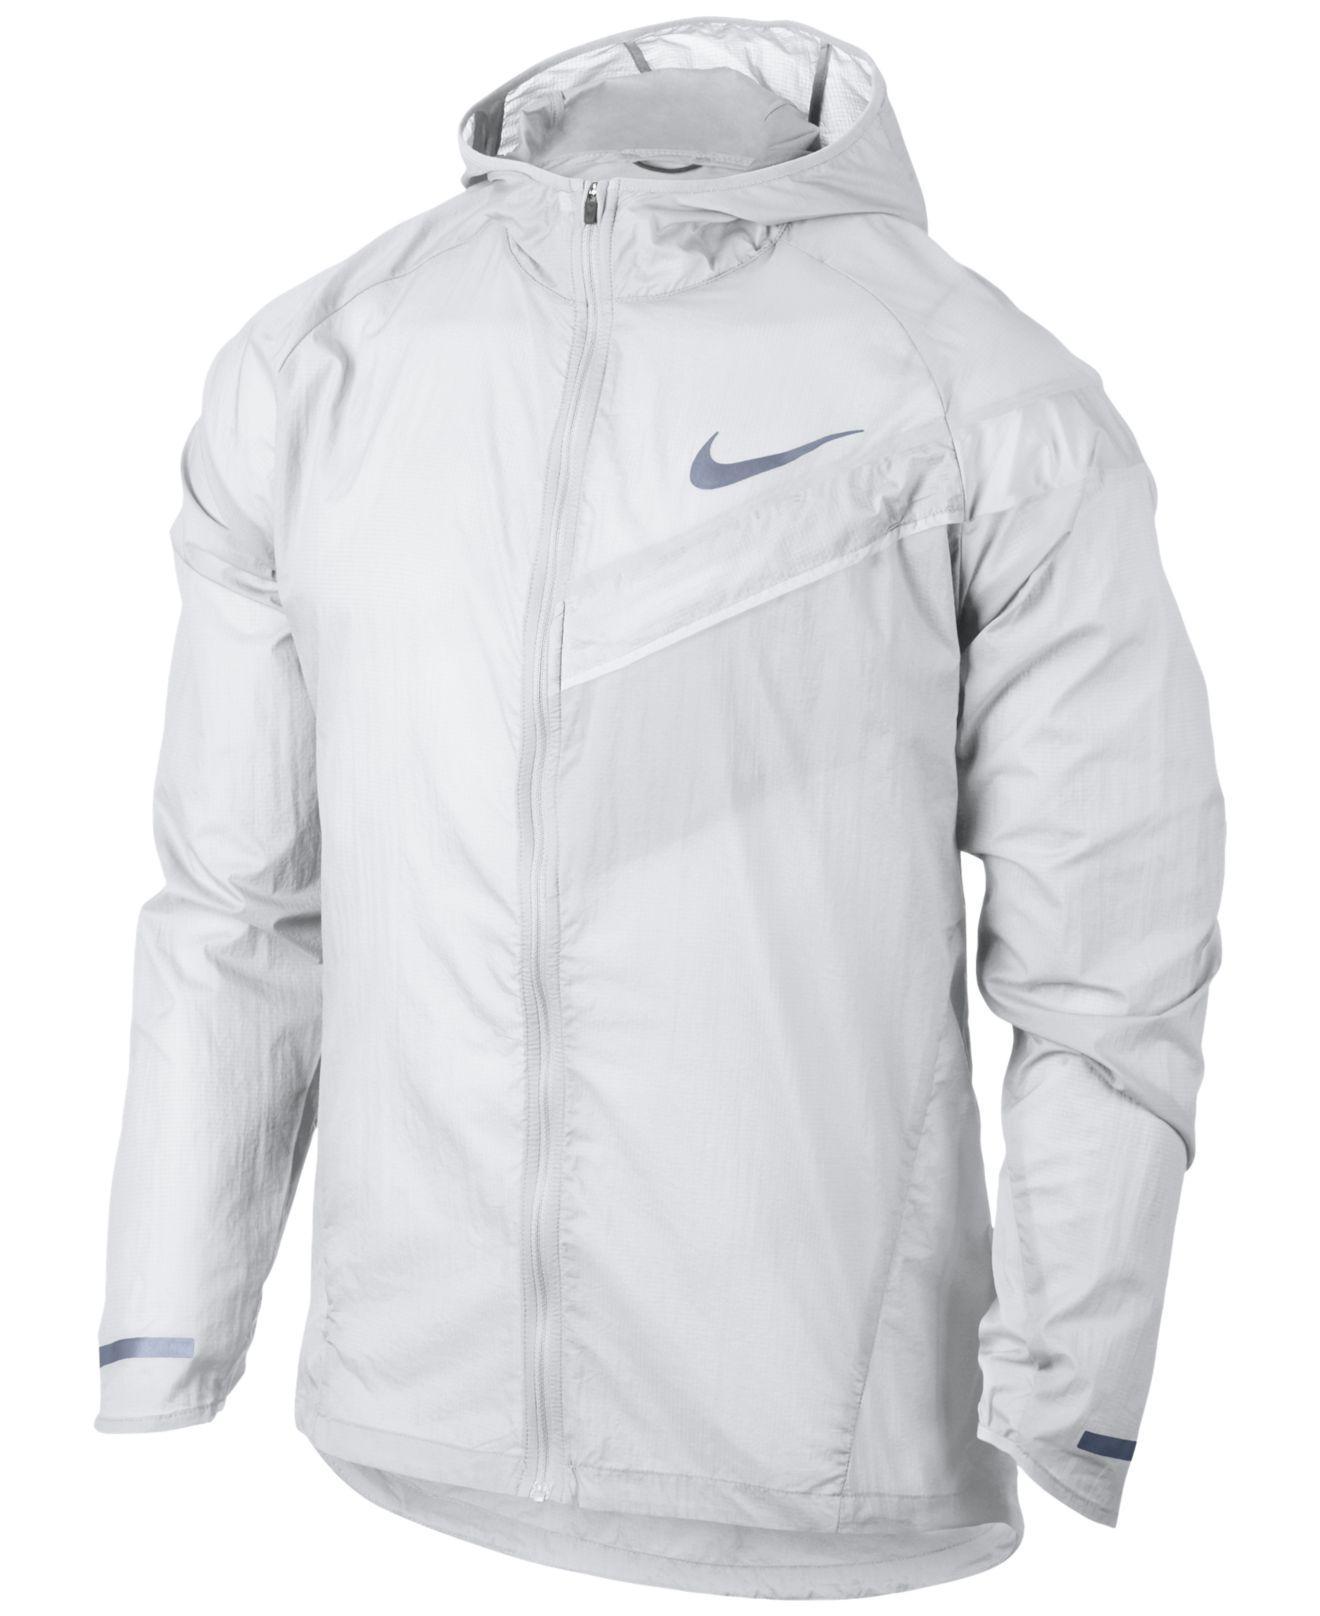 quality design b5f5d 92b85 Nike Men s Impossibly Light Running Jacket in White for Men - Lyst